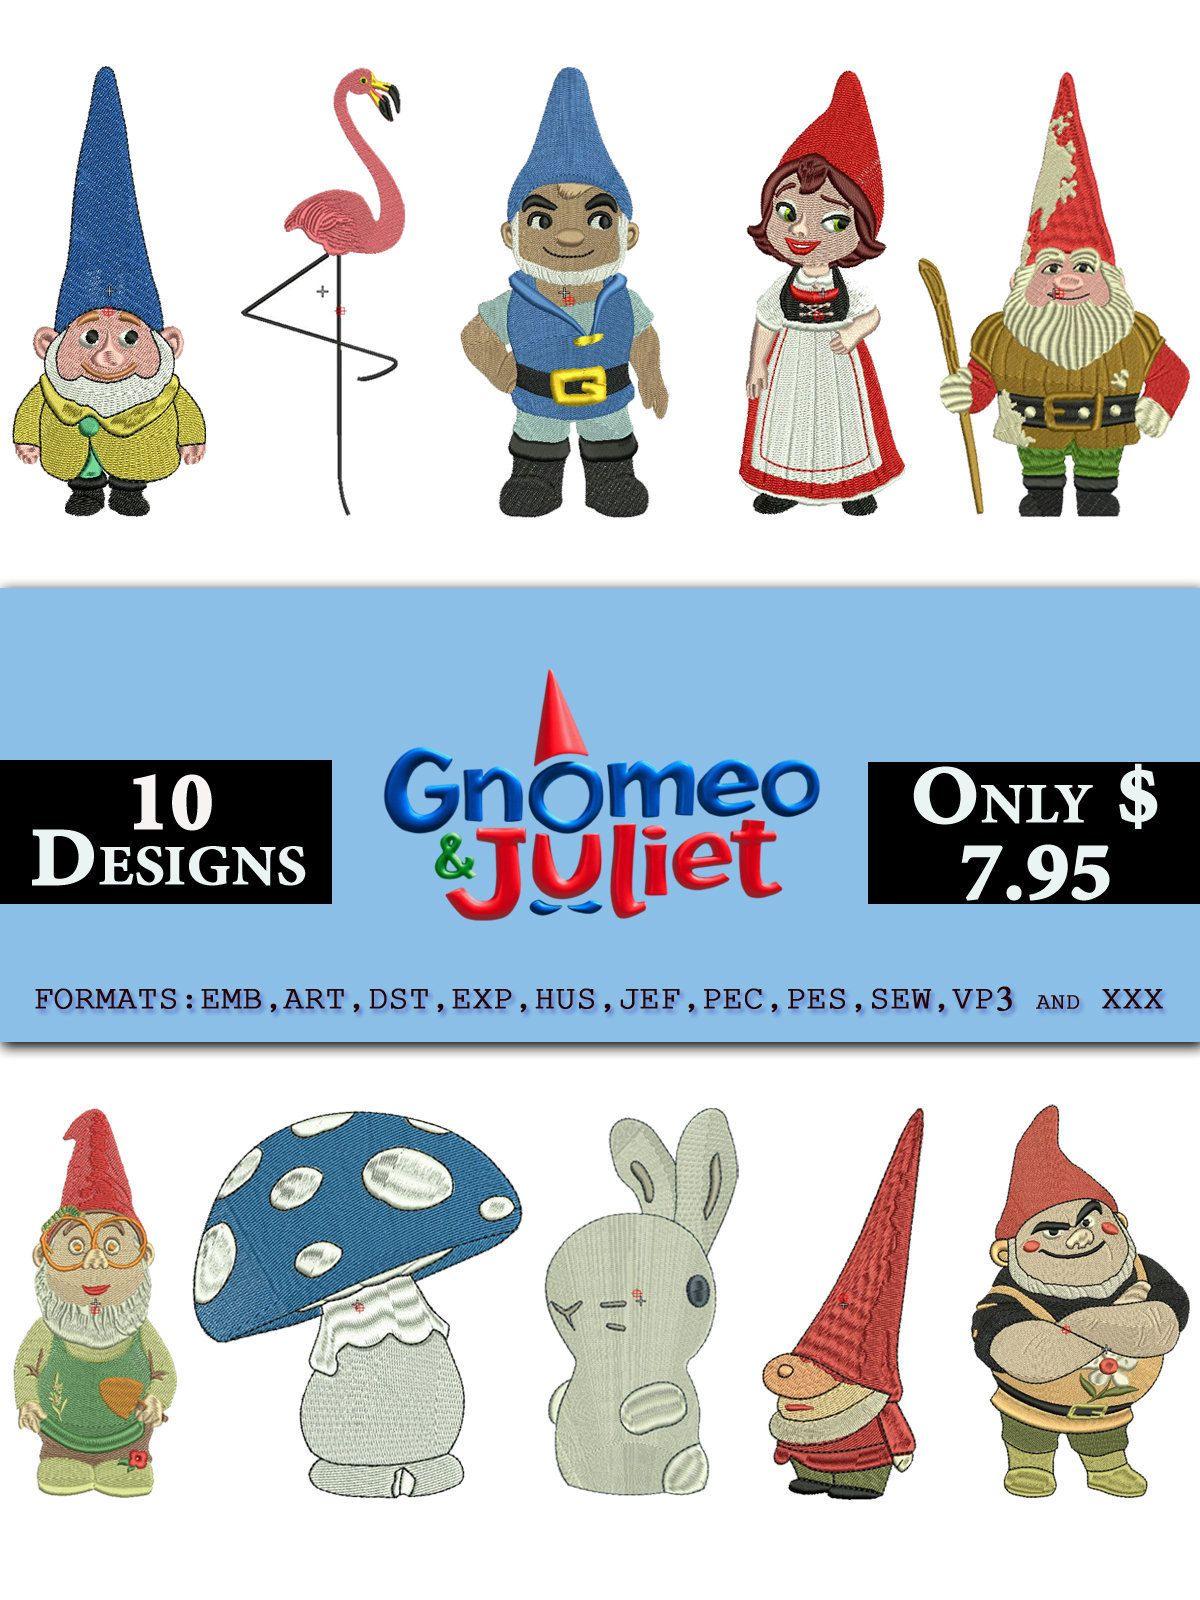 10 gnomeo juliet sherlock gnomes embroidery design juliet